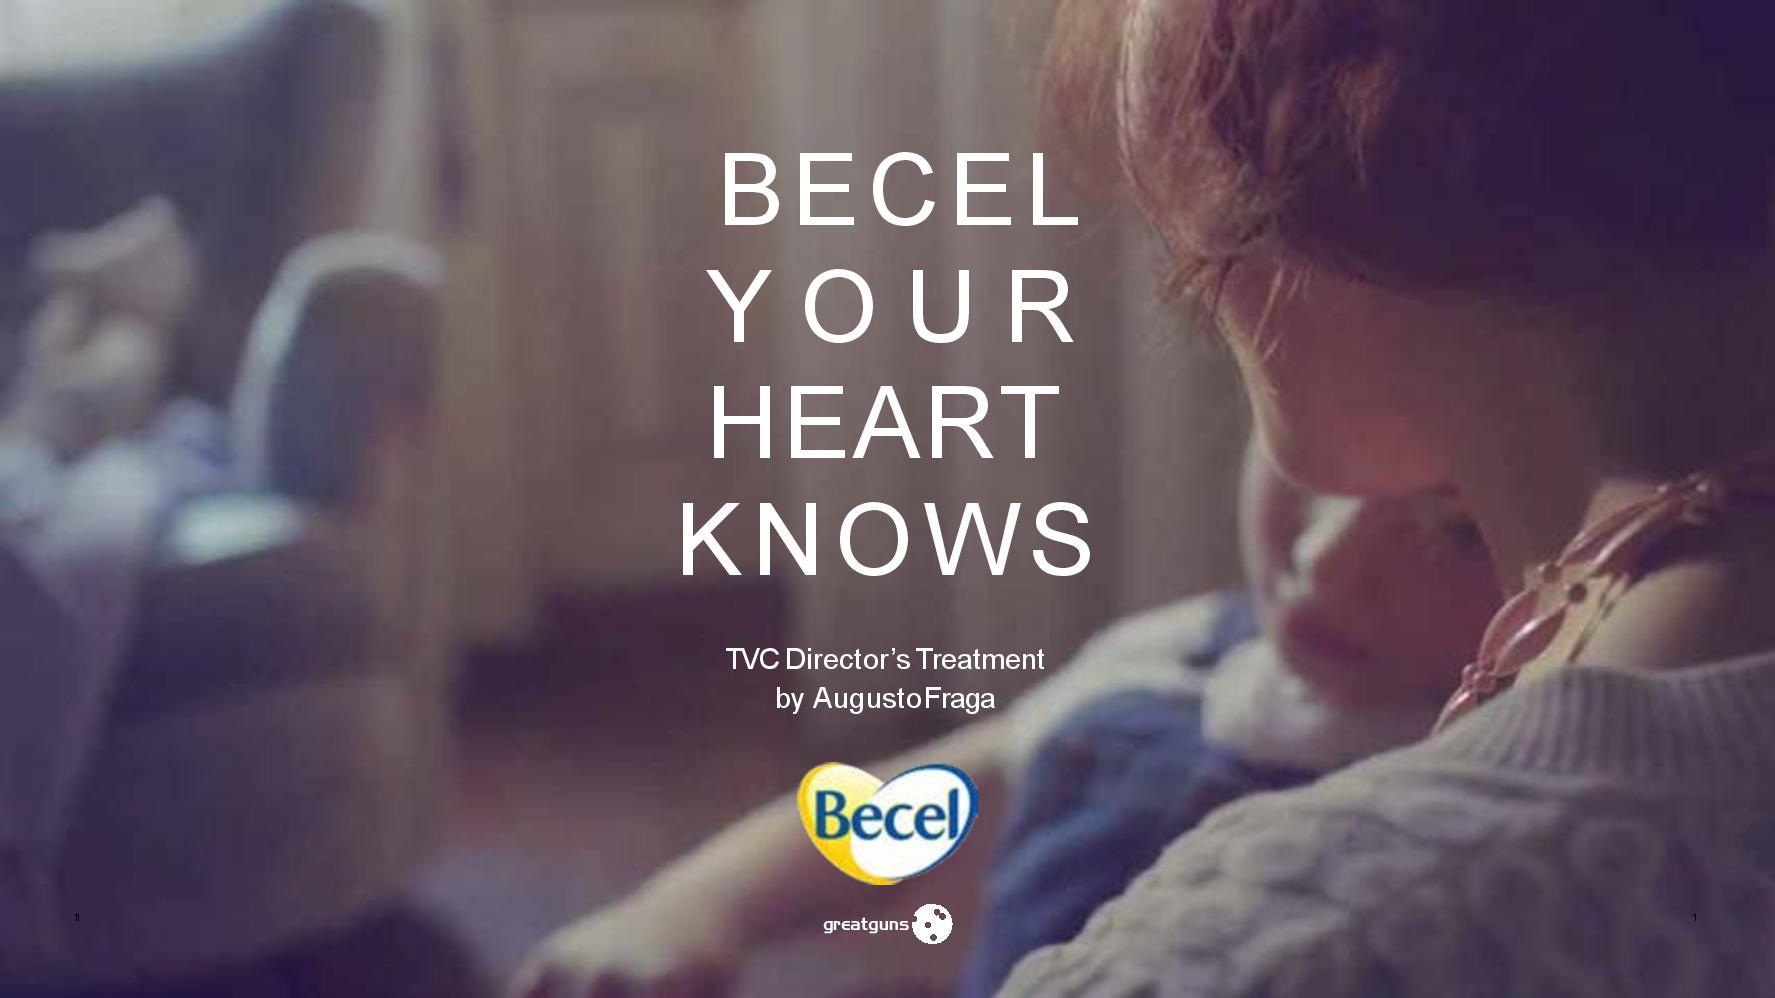 BECEL-page-001.jpg